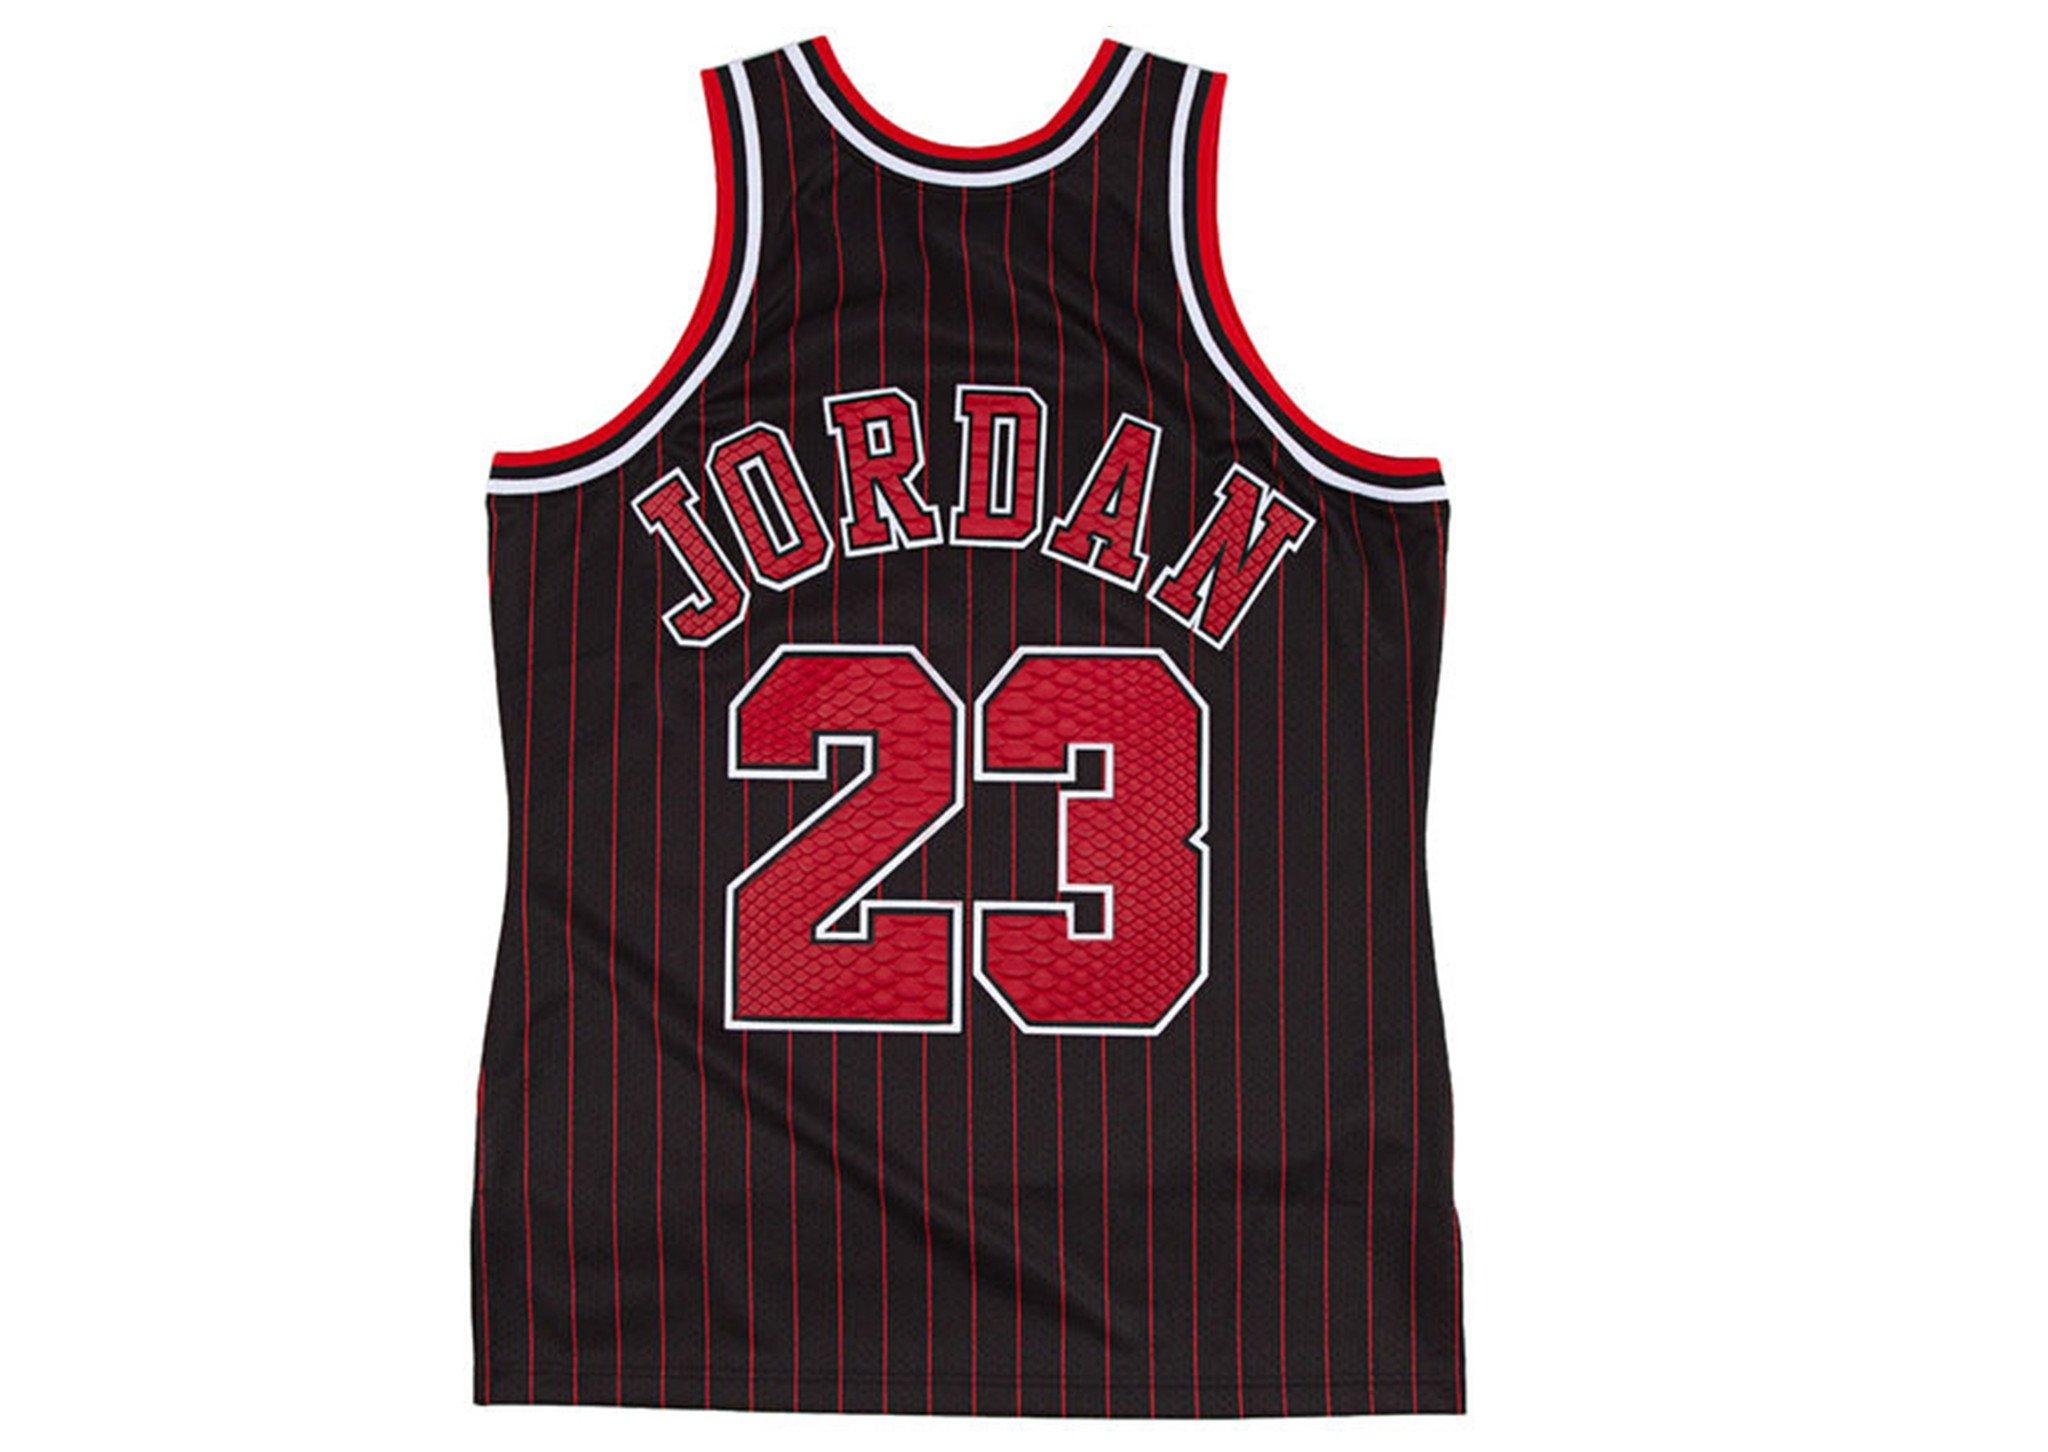 michael jordan jersey mitchell and ness